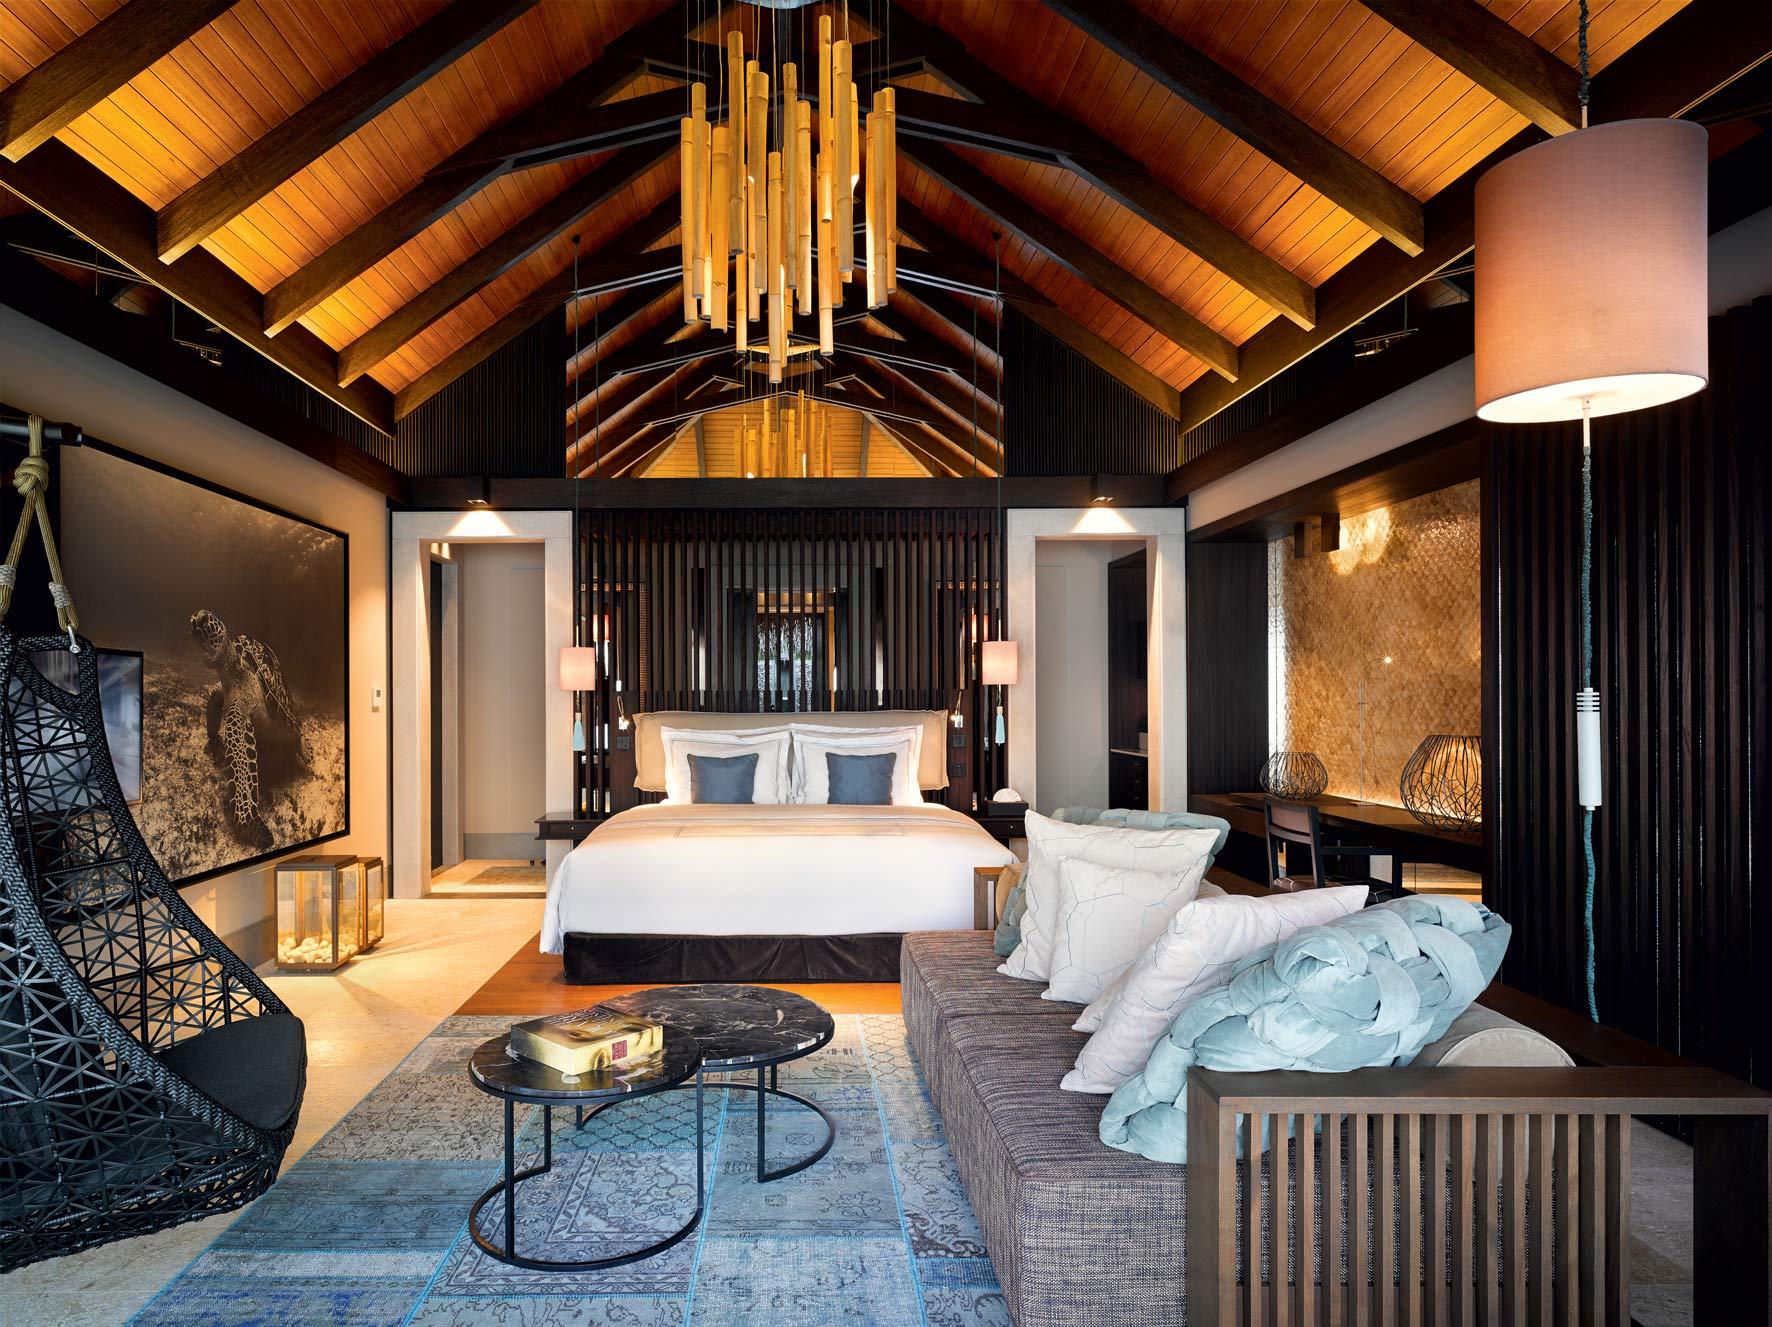 Luxury Escapes 2018 - Velaa Private Island - luxury hotels - private islands - sea turtles